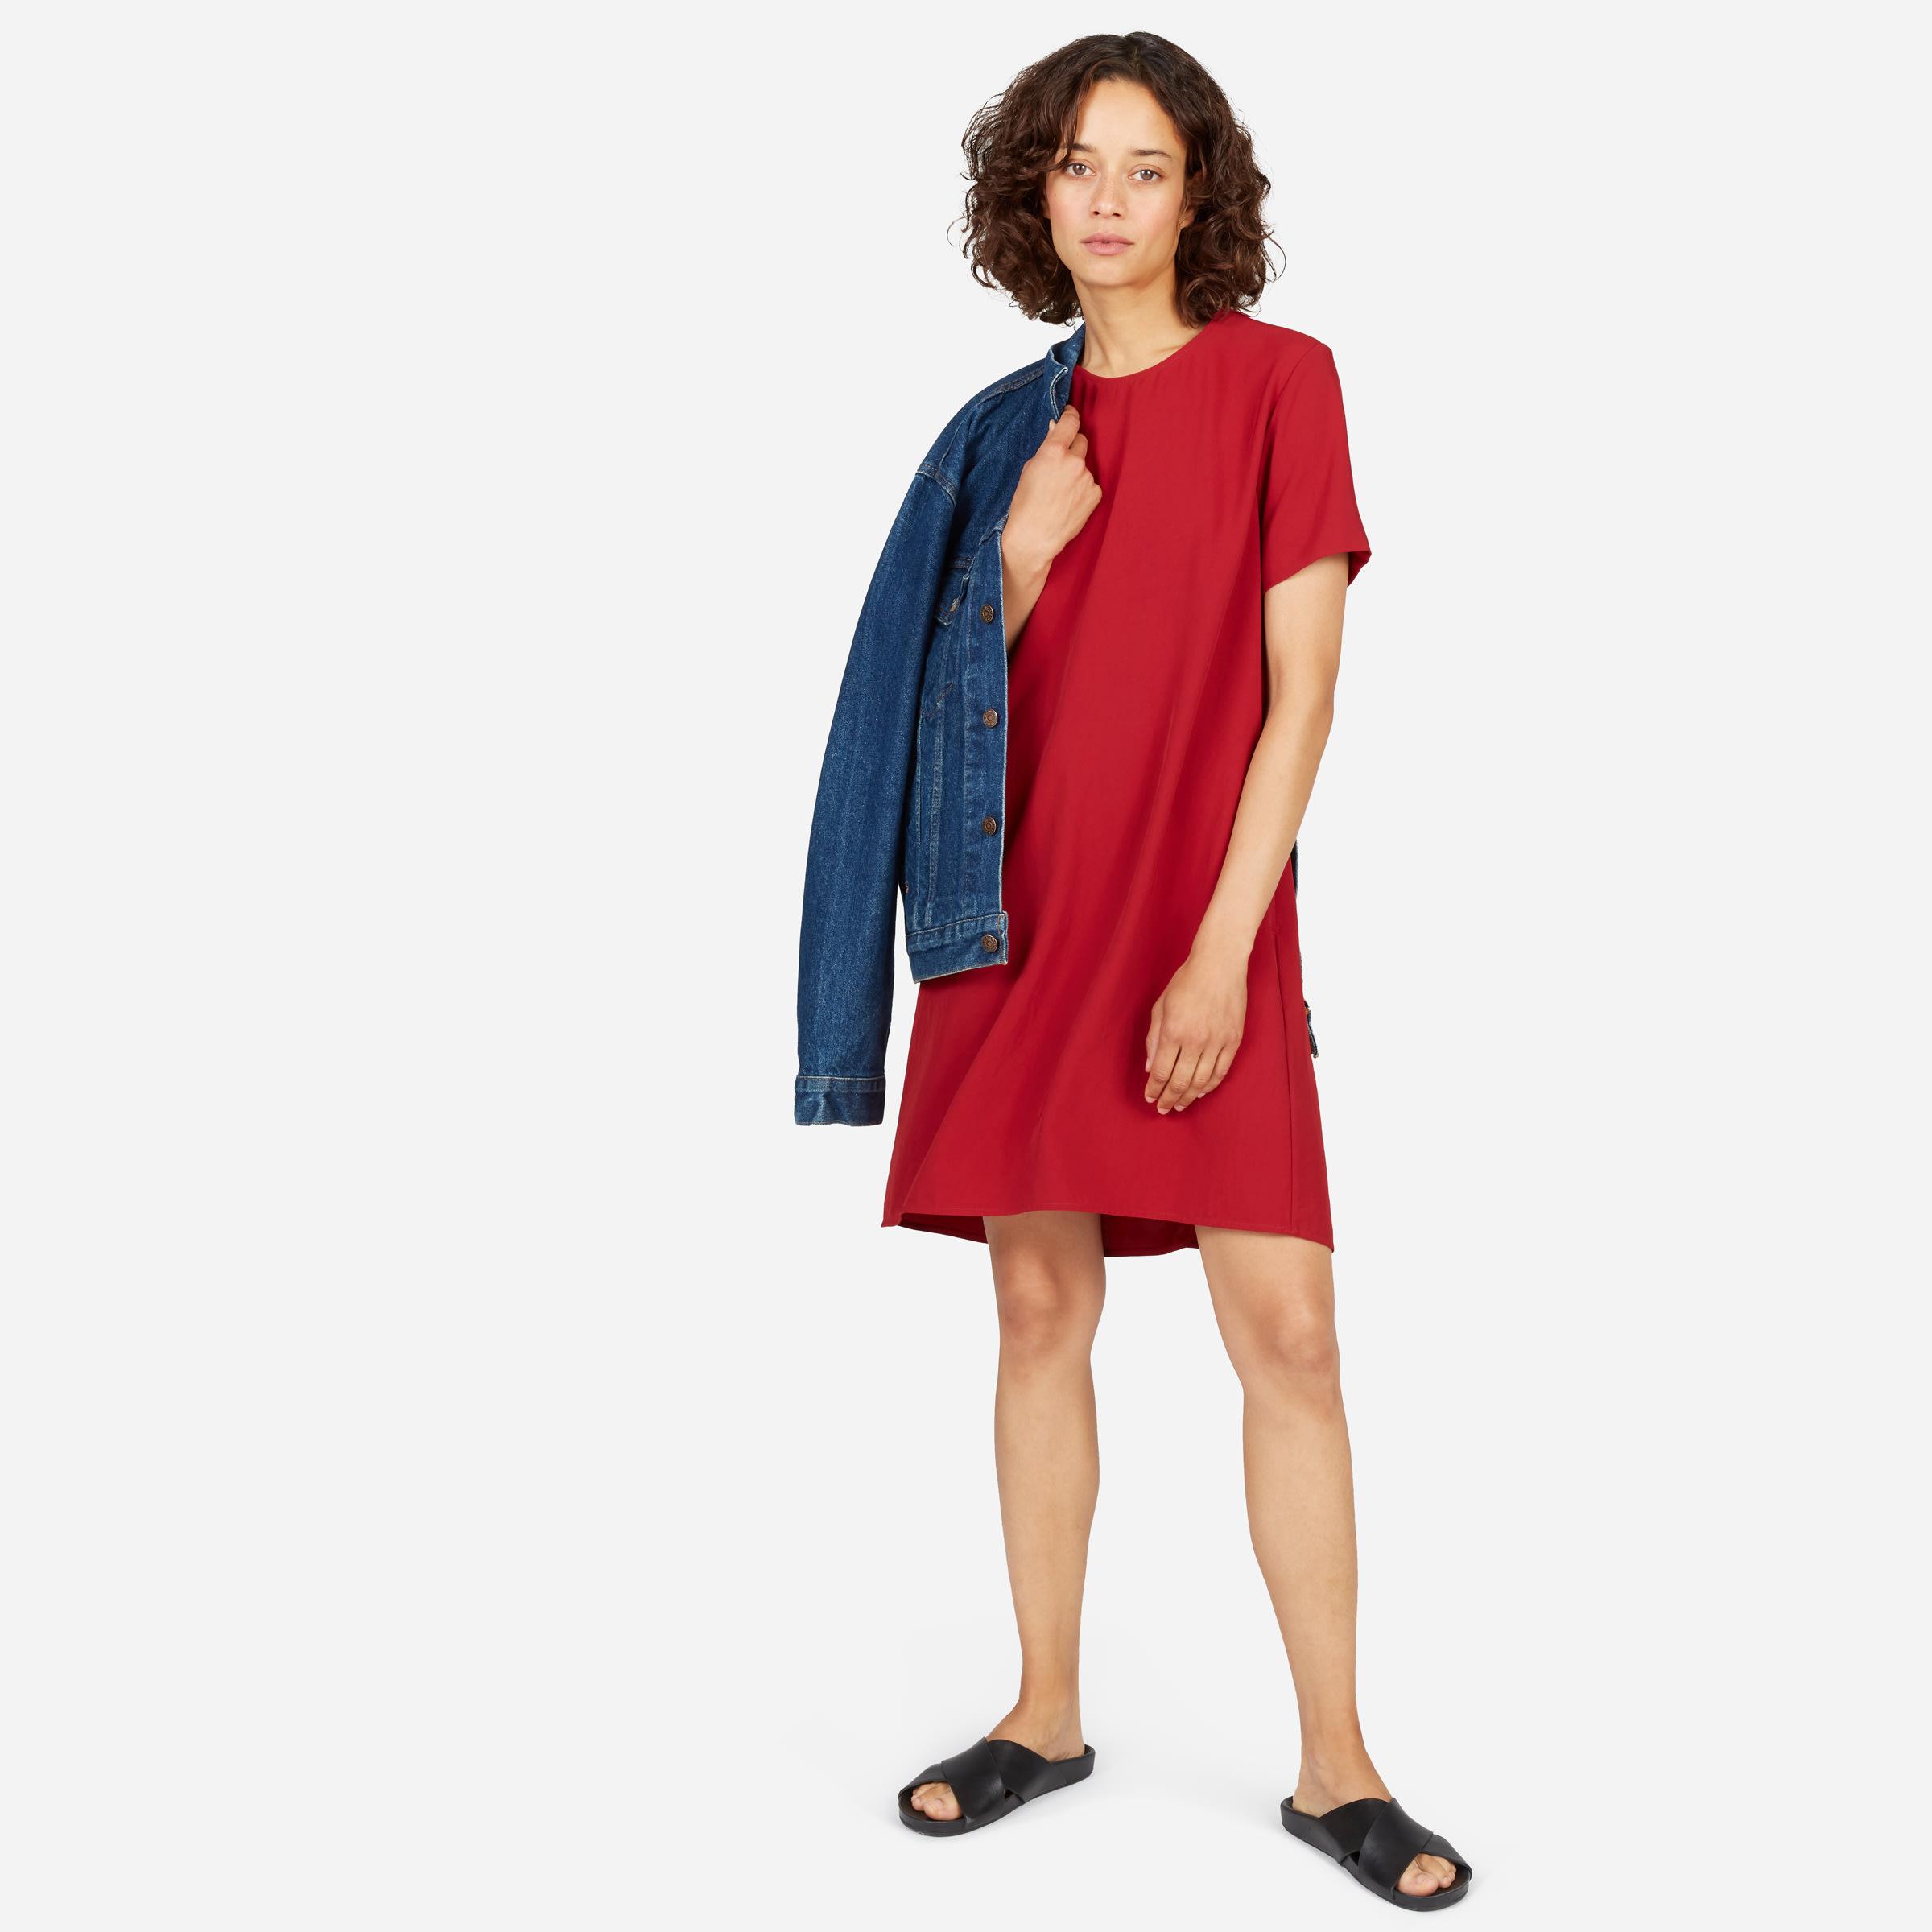 7bfbd4117a Women's Japanese GoWeave Short-Sleeve A-Line Dress | Everlane